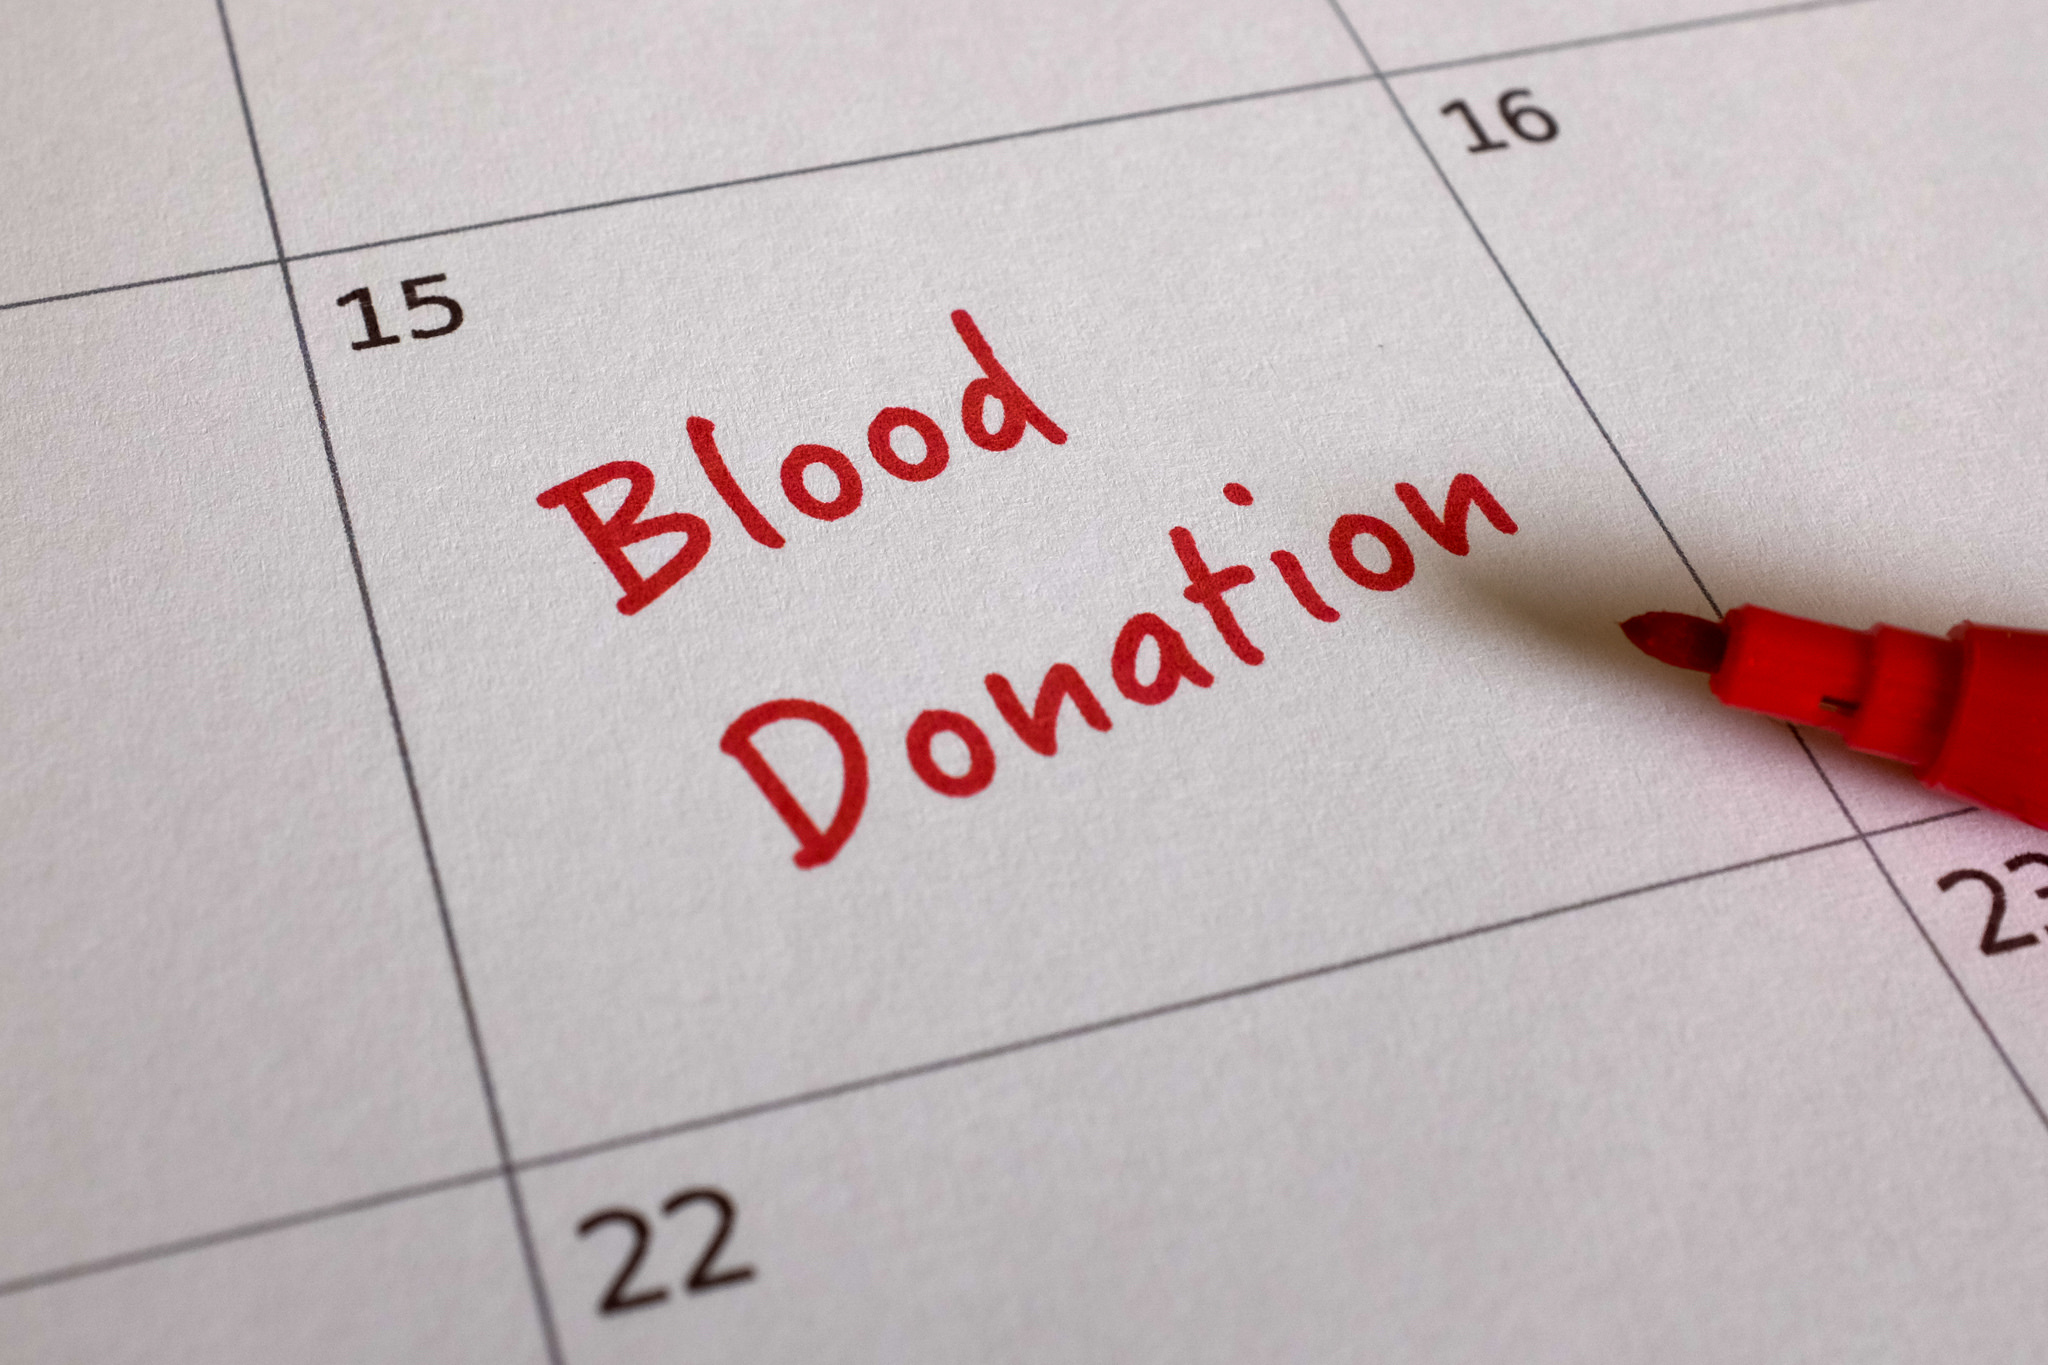 Blood Donation Needle Gauge Www Topsimages Com